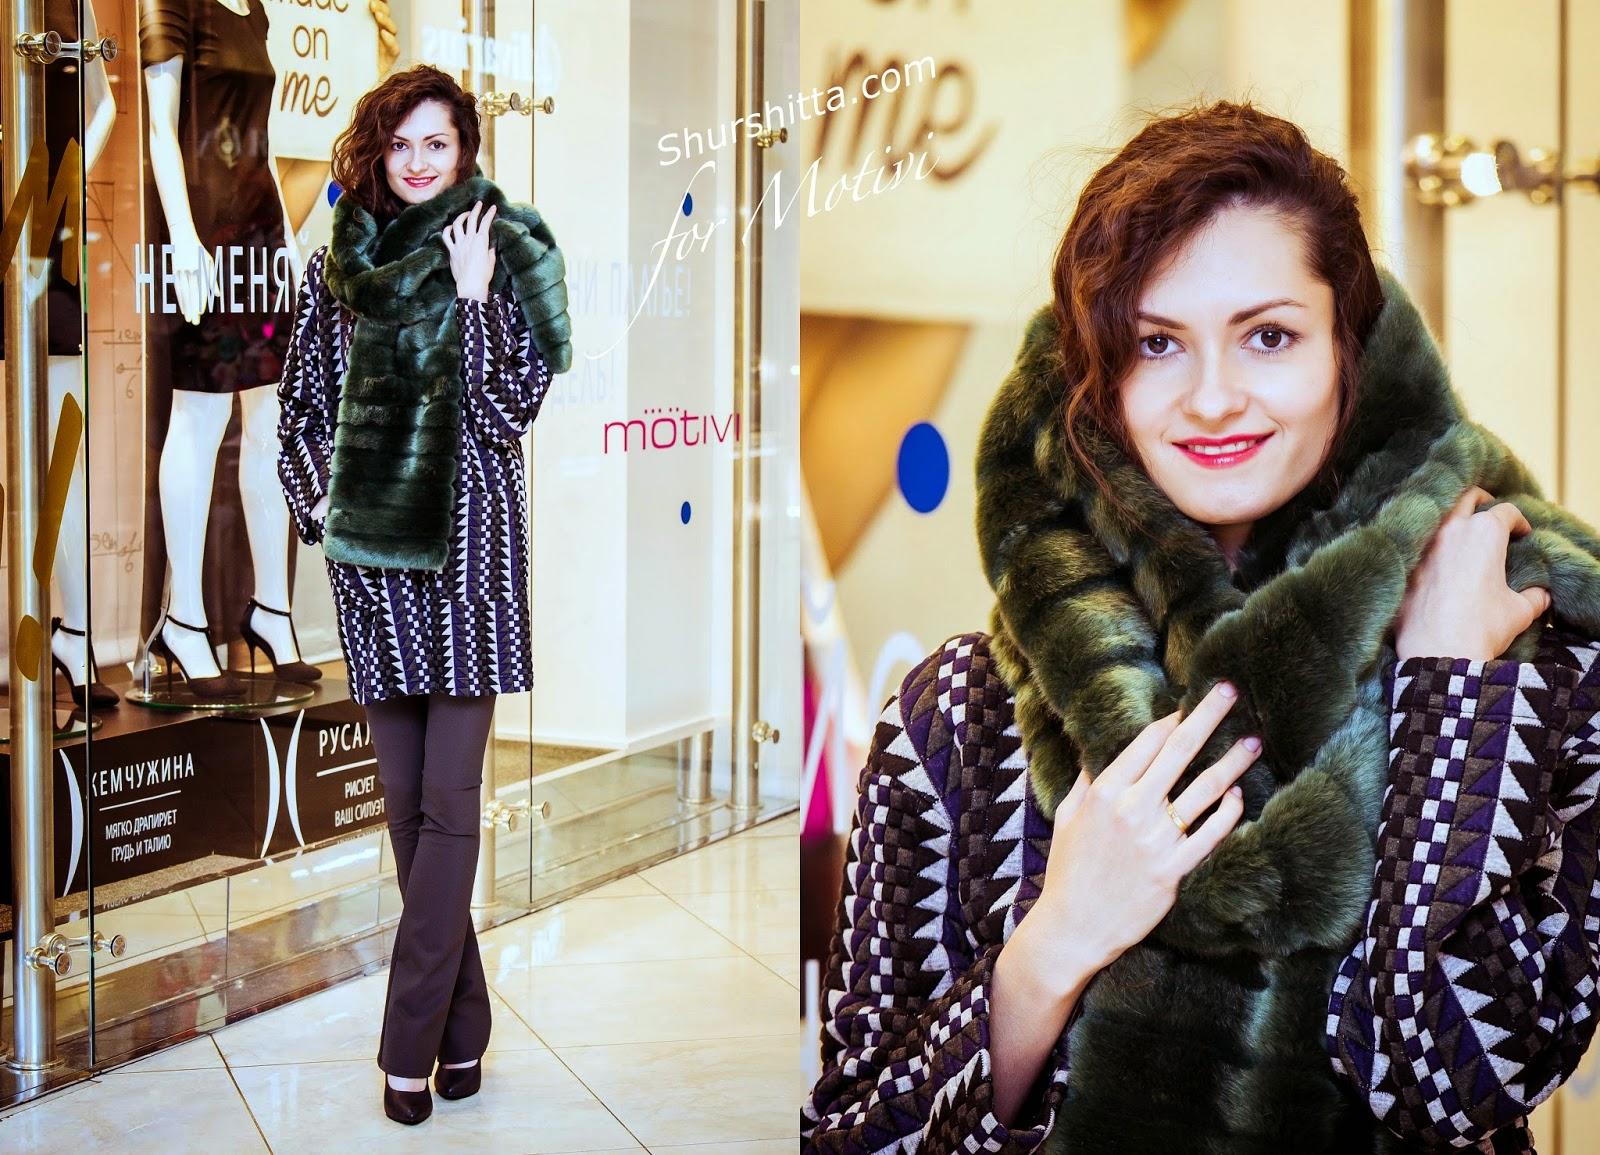 Анастасия Грибач и Motivi для проекта Made On Me